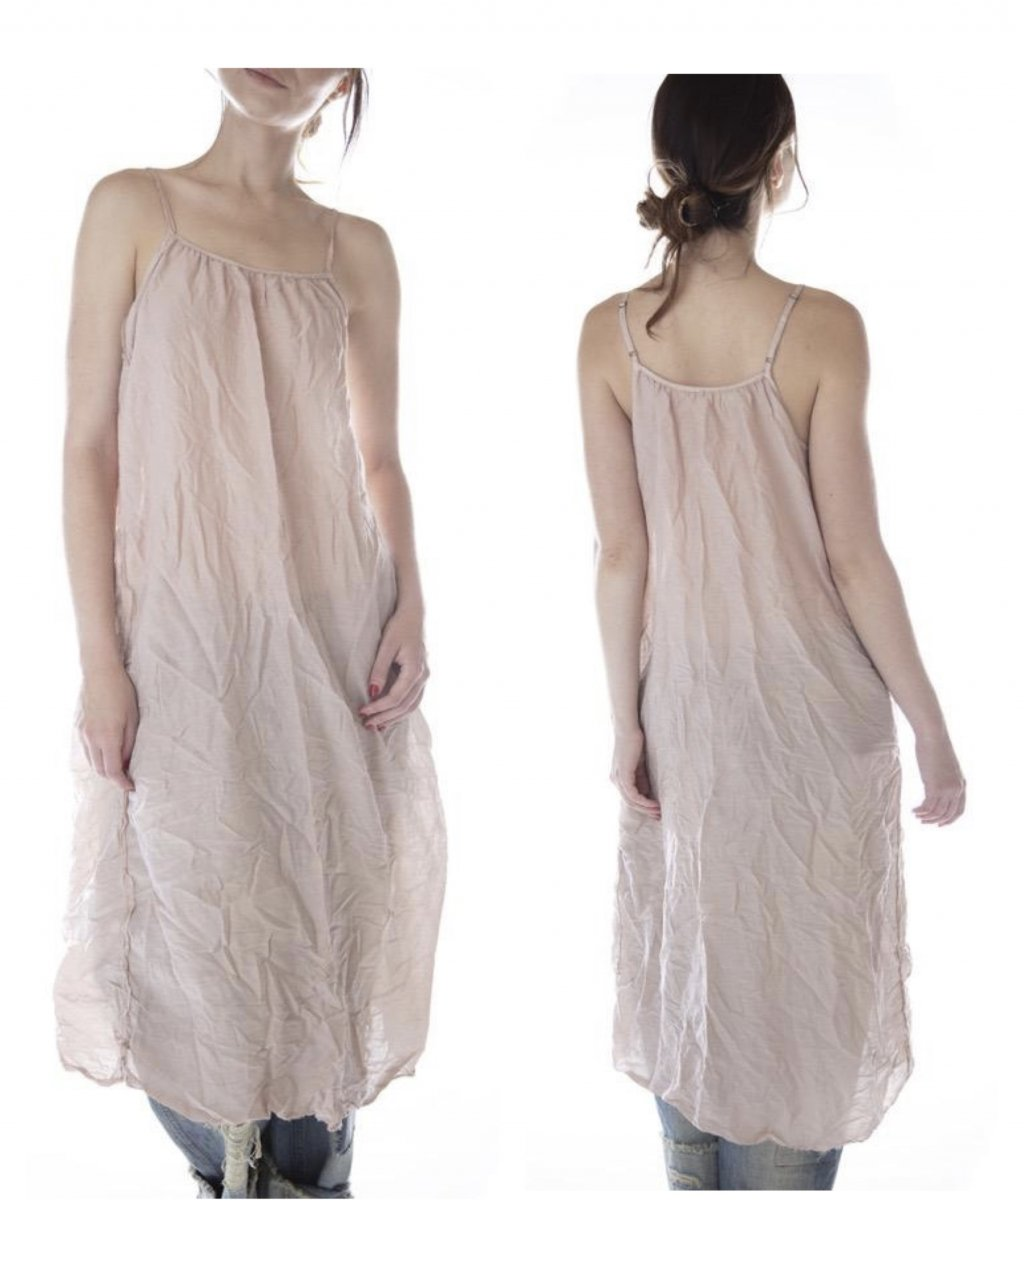 Magnolia Pearl   Audrey Simple Slip in Cotton Silk   Molly